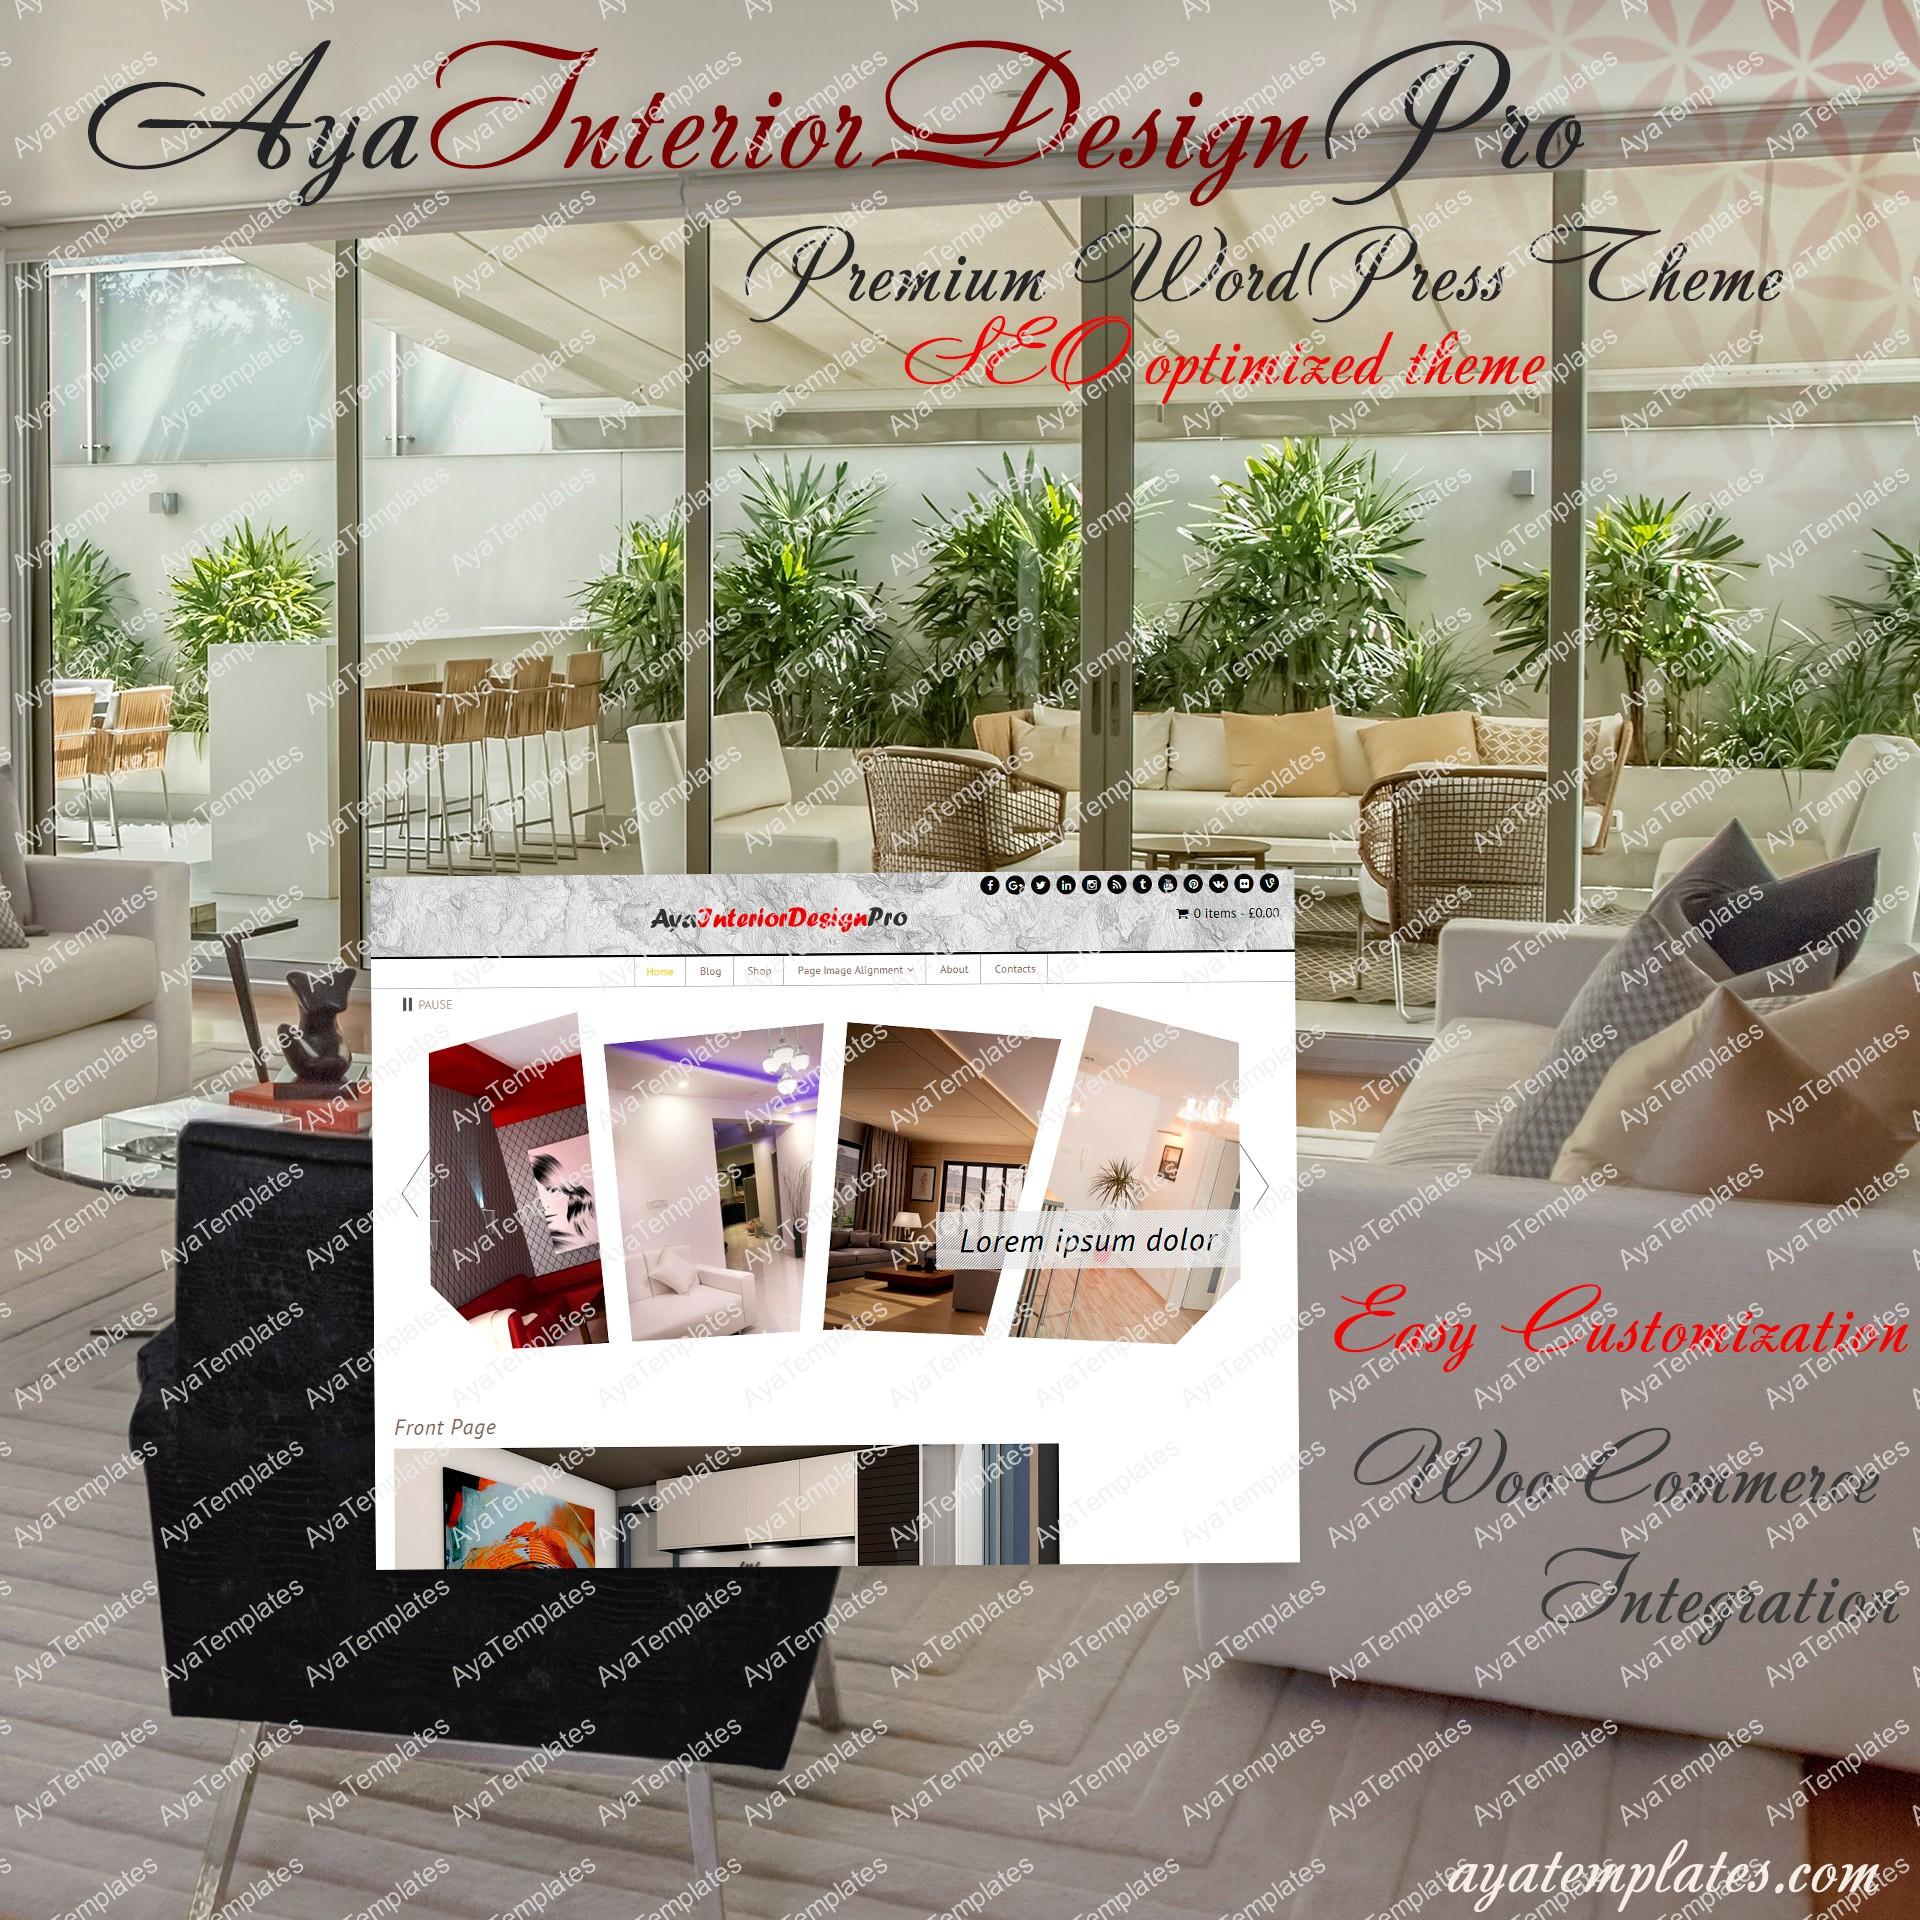 ayainteriordesignpro-premium-wordpress-theme-mockup-ayatemplates-com